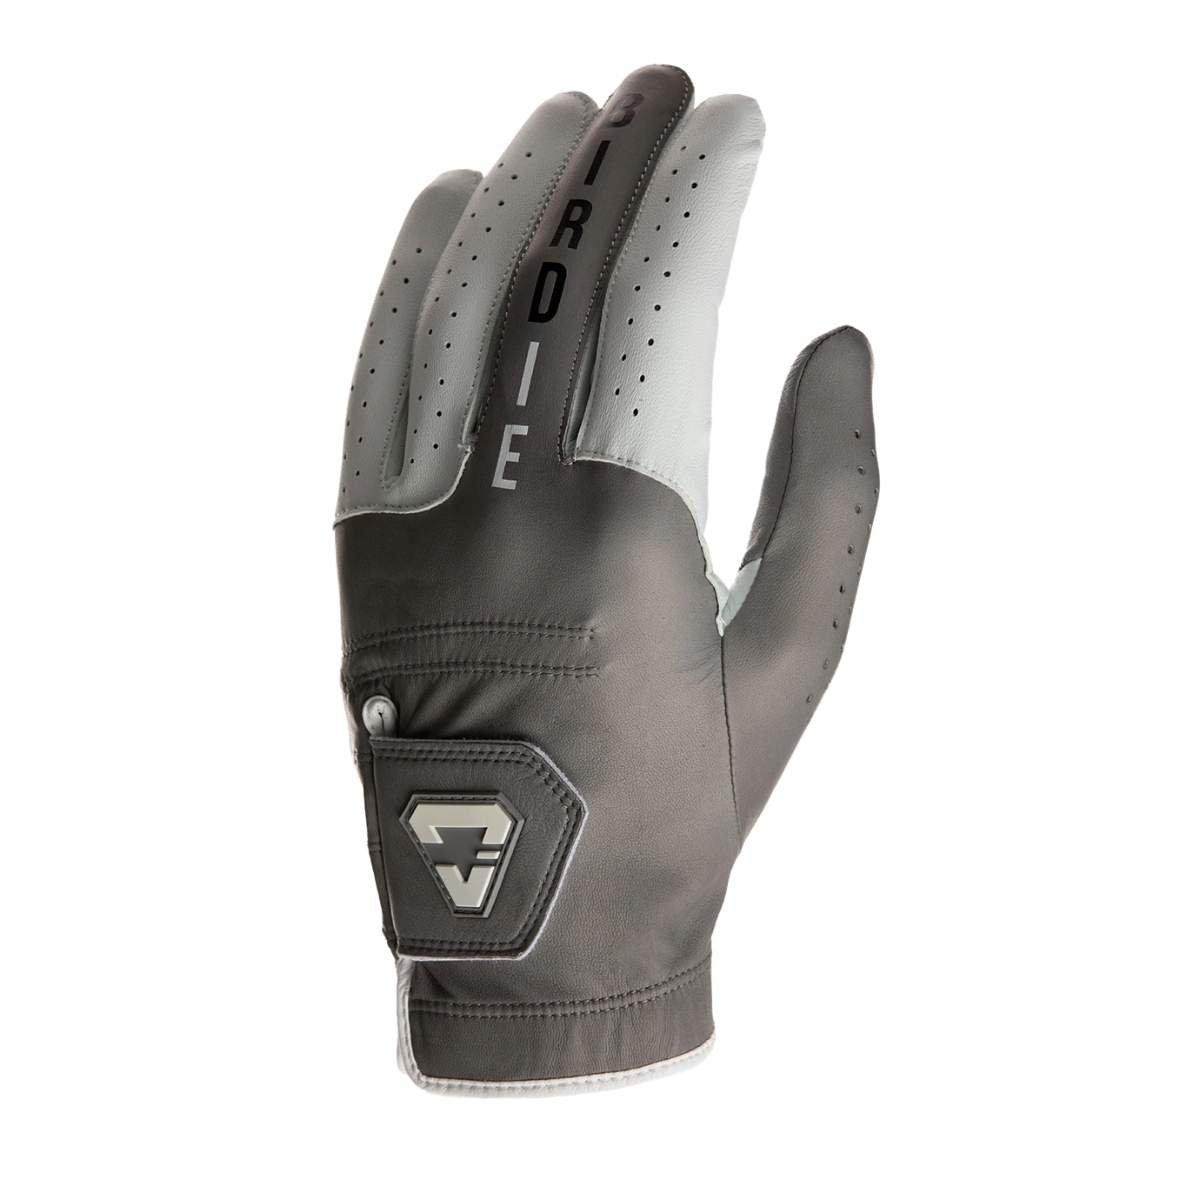 TravisMathew Between The Lines Golf Glove - Left Hand Regular